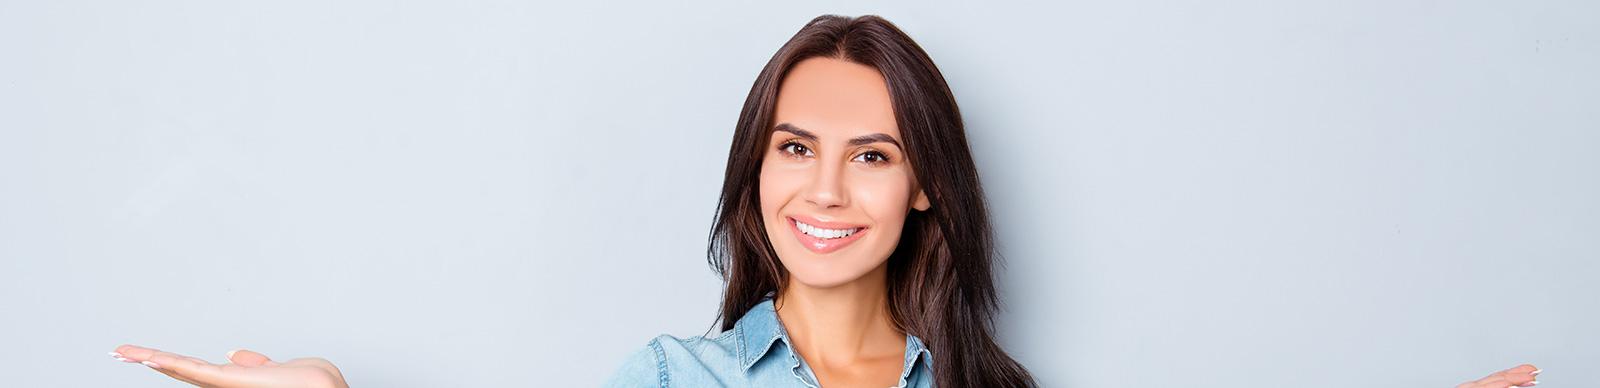 Feel Like Natural Teeth With Dental Implants in Brampton area